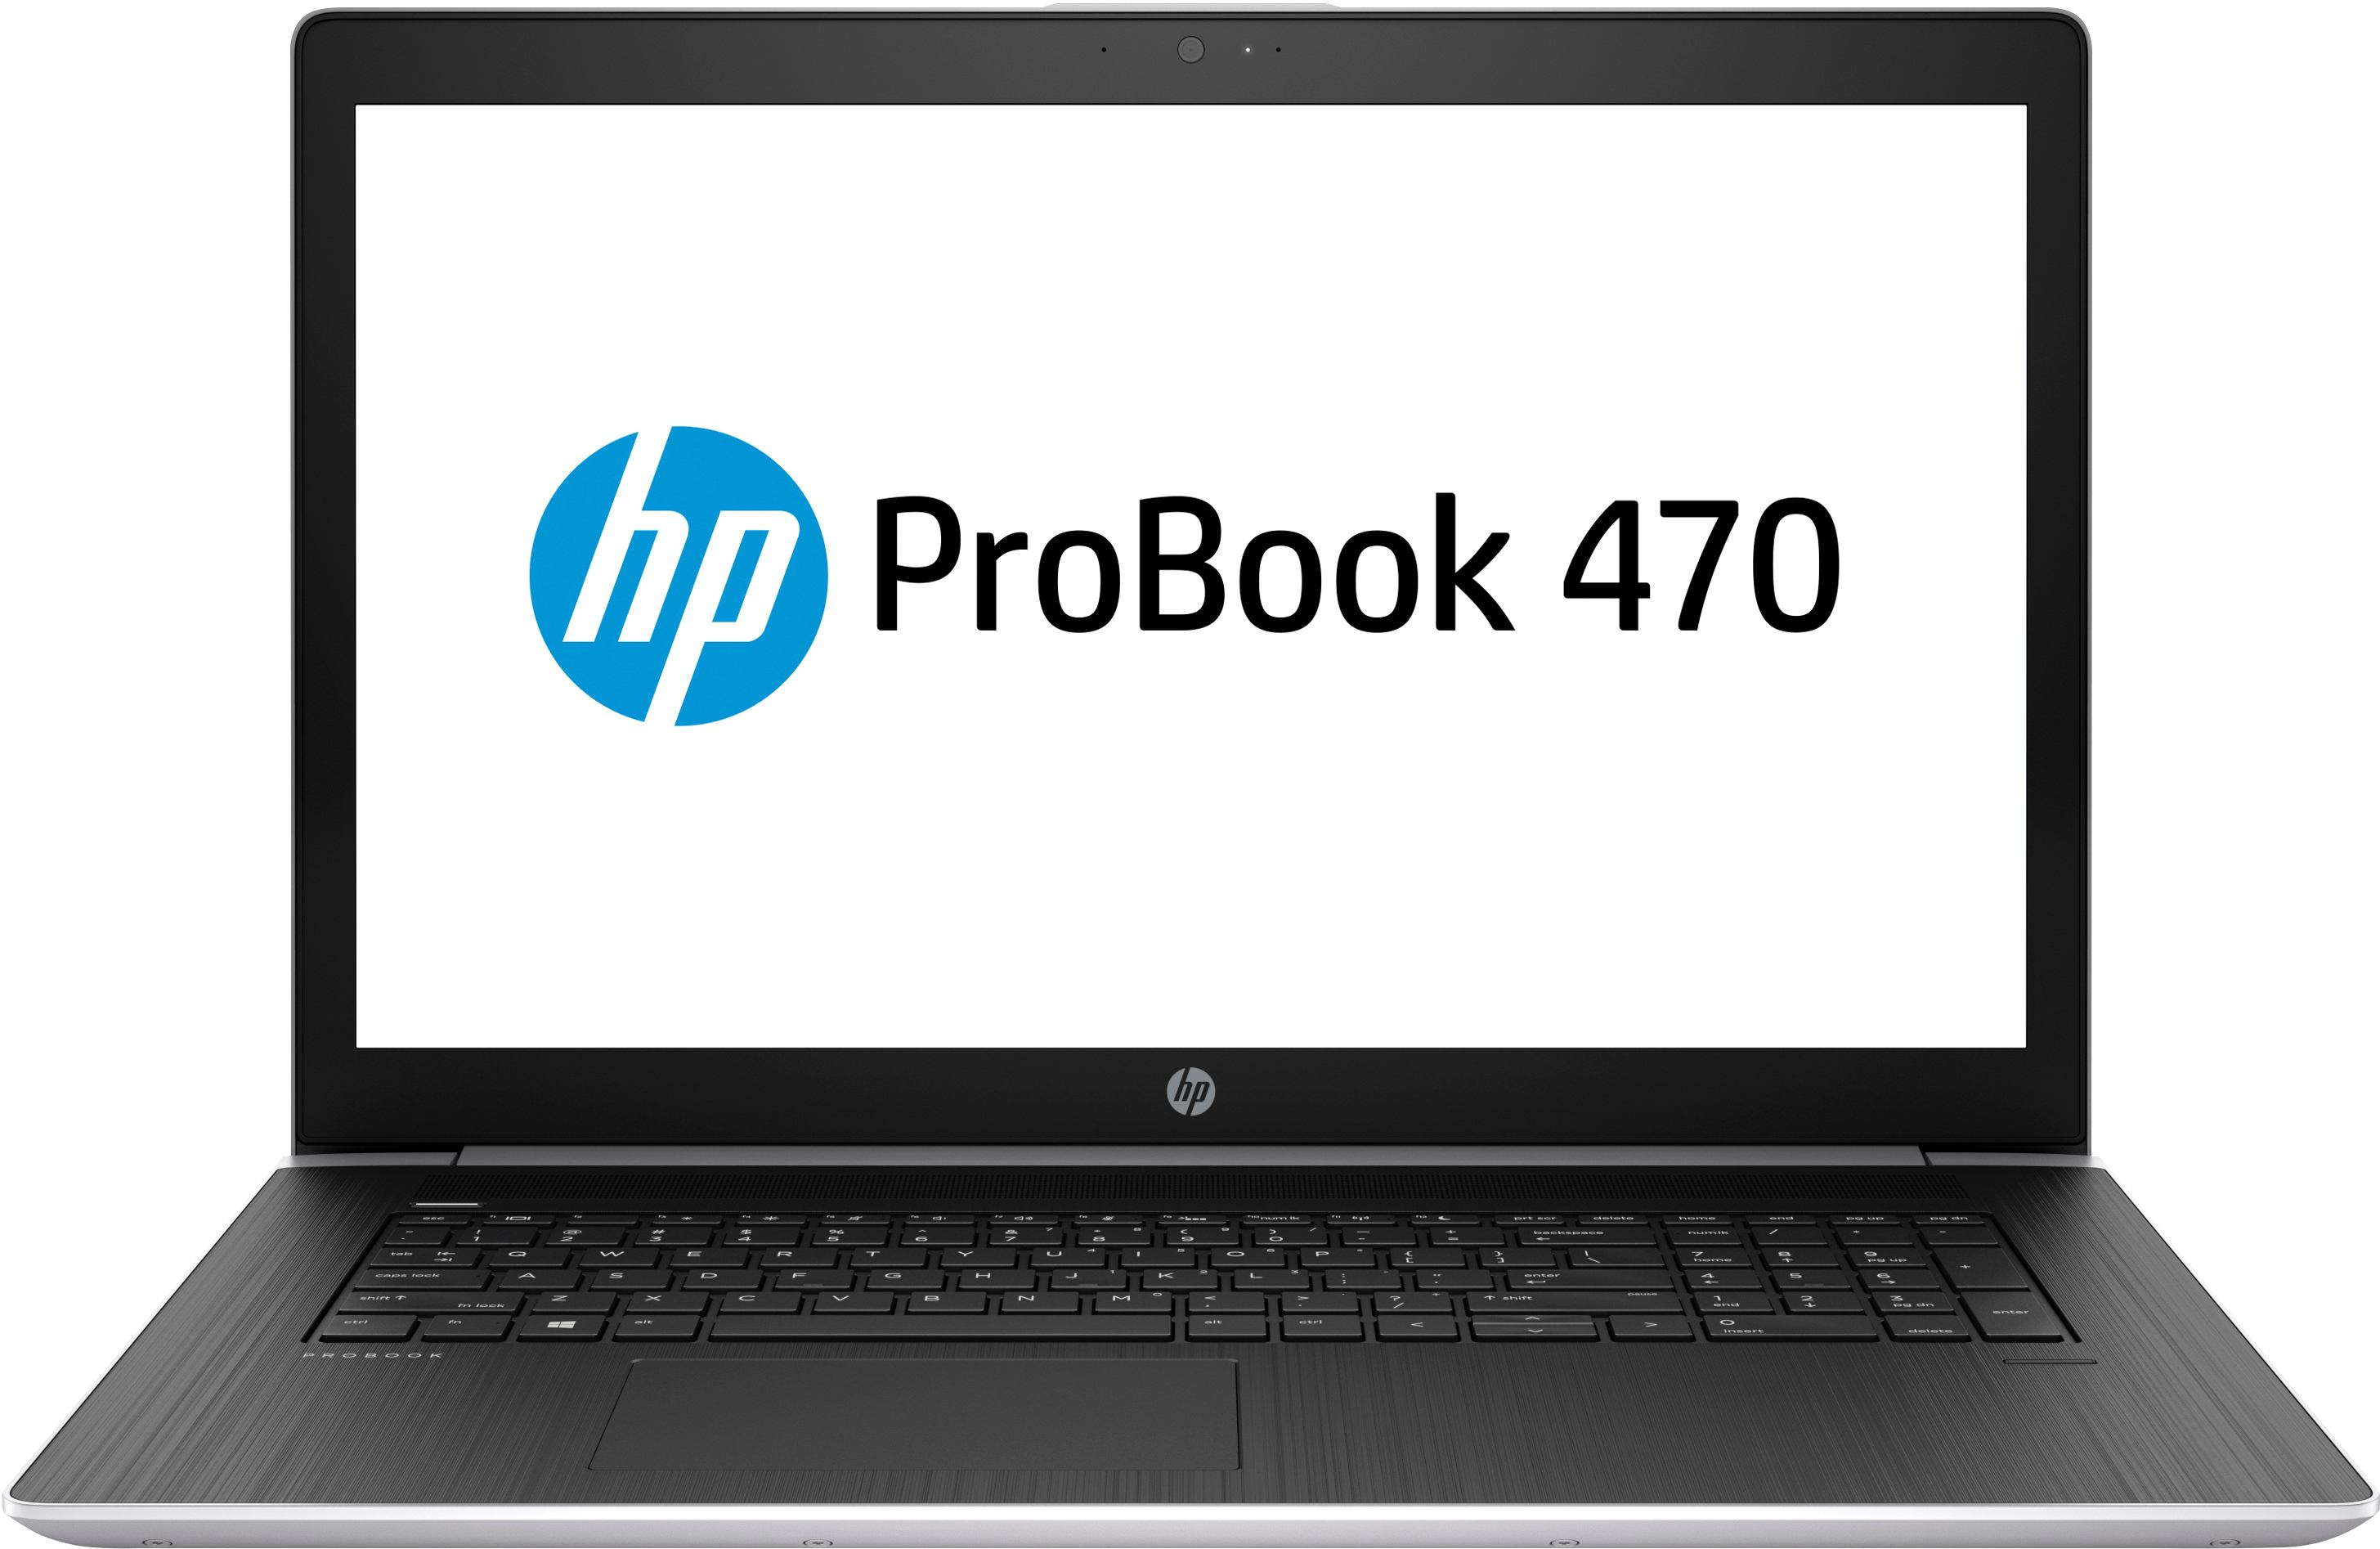 2488807-HP-ProBook-470-G5-Argento-Computer-portatile-43-9-cm-17-3-1920-x-1080